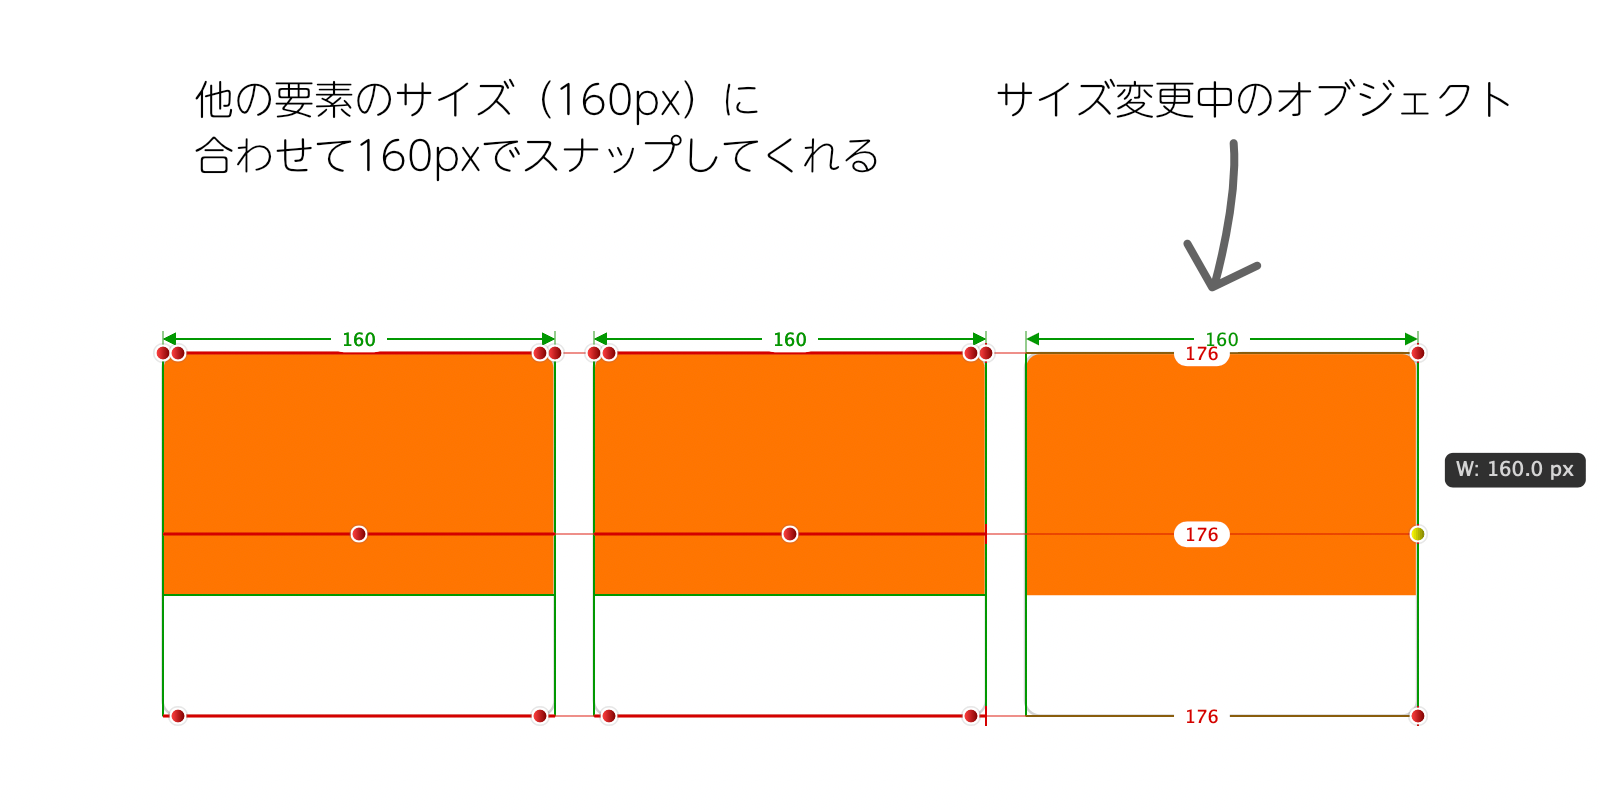 Affinity Designerの動的ガイドでオブジェクトのサイズが表示されている画面。オブジェクトのサイズを変更すると他のオブジェクトのサイズに合わせてスナップしてくれることを表しています